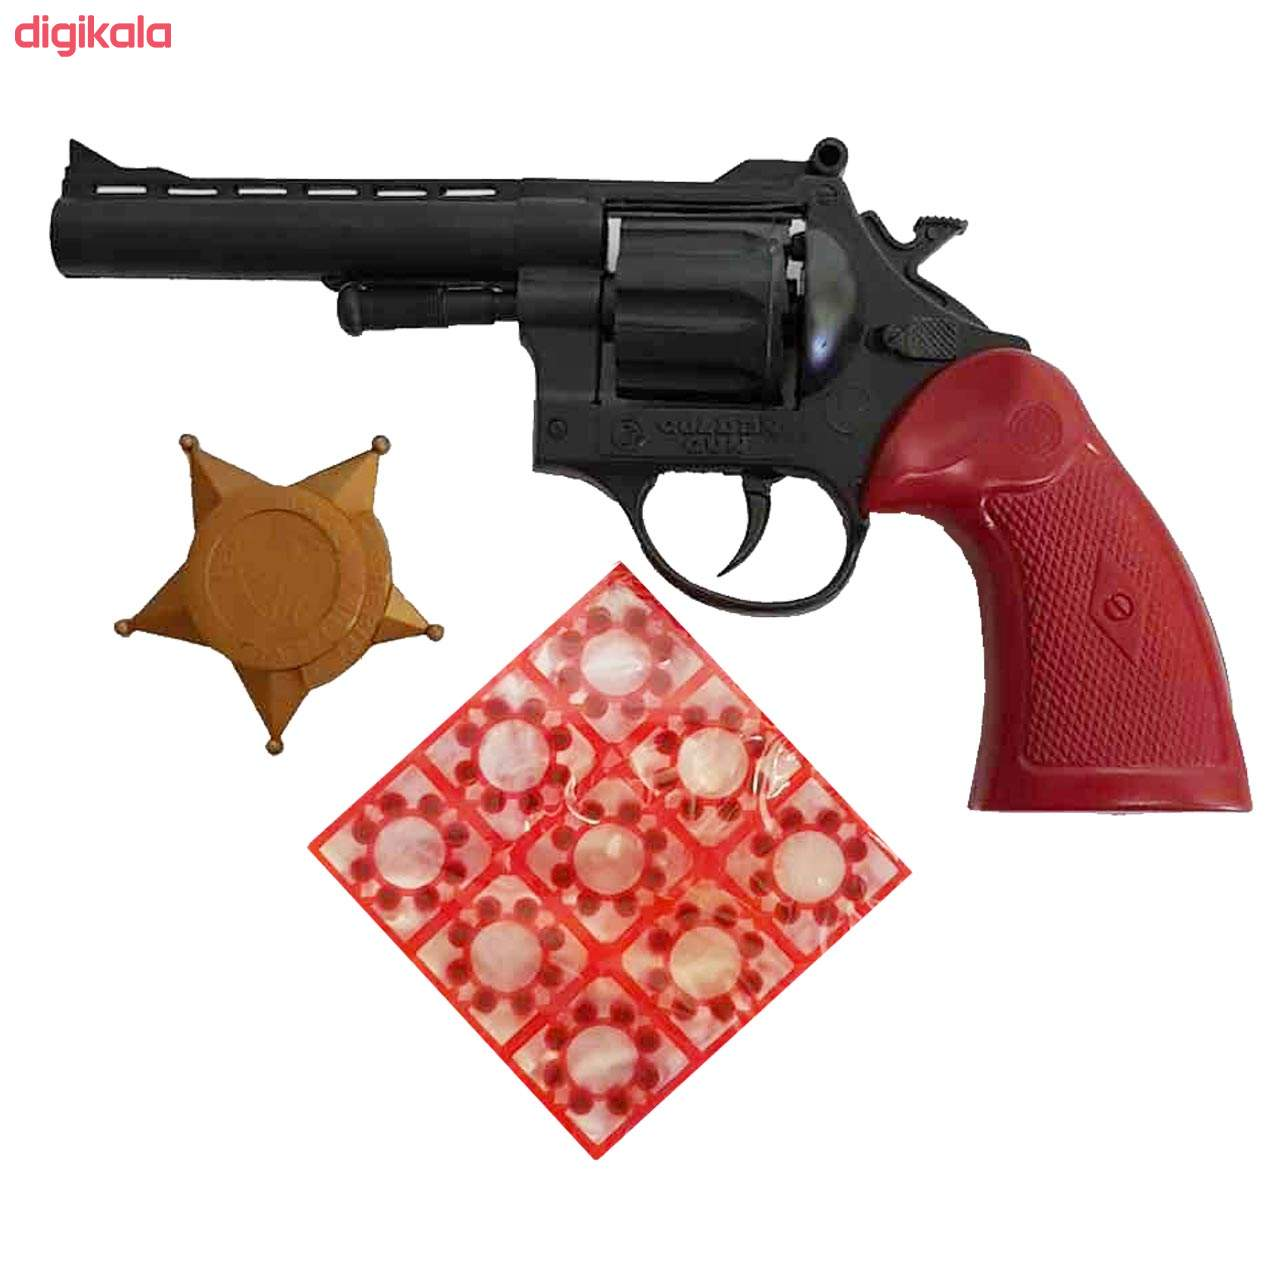 تفنگ بازی مدل کلانتر کد 112 مجموعه 3 عددی main 1 1